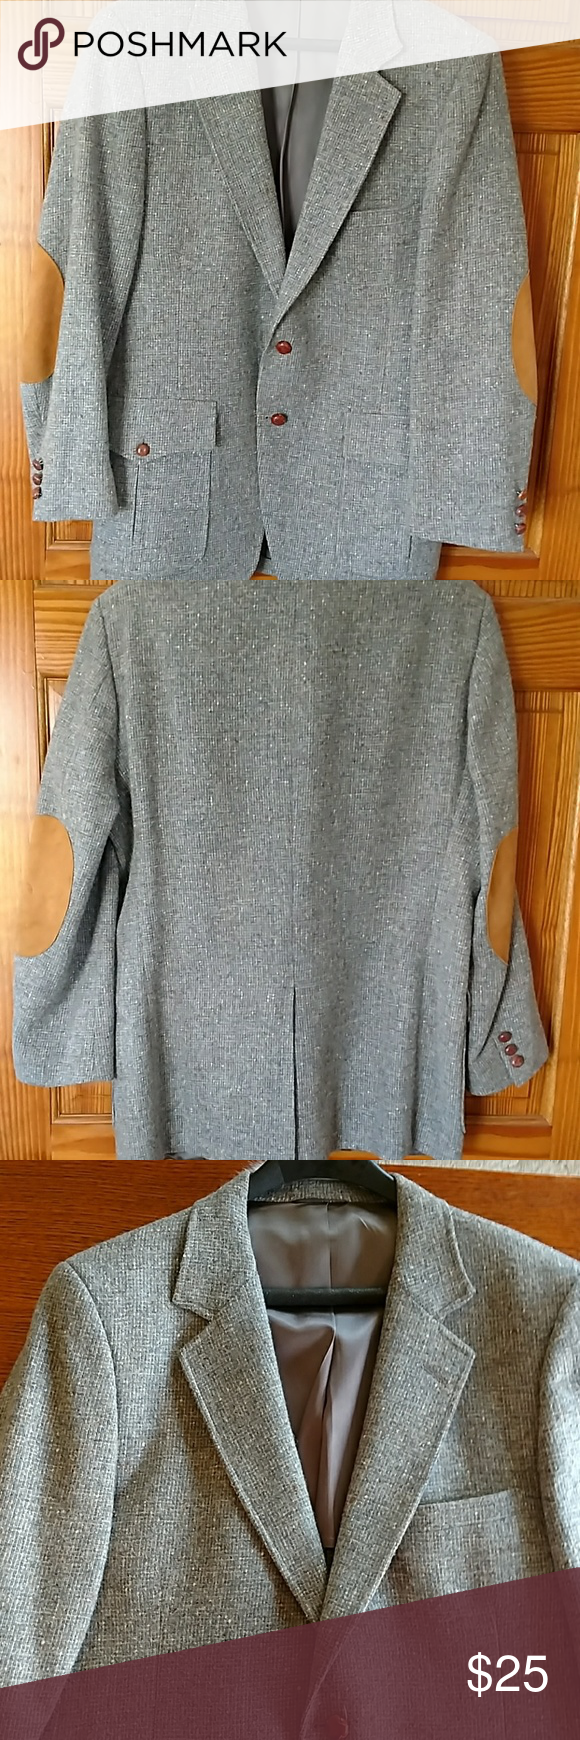 Men's Vintage suit jacket. Size L Gray Tweed with elbow